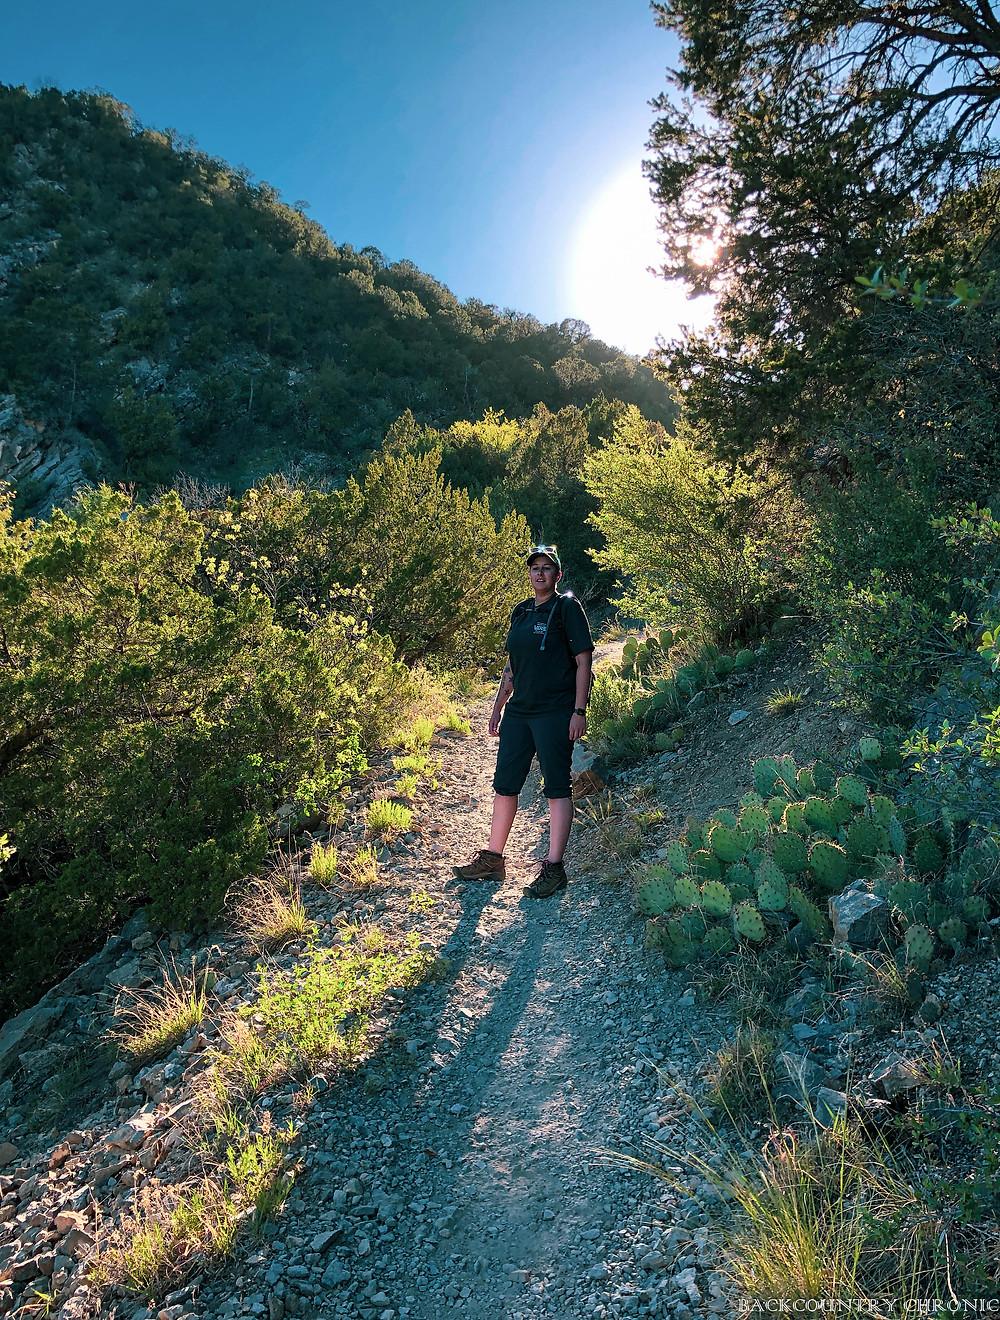 Hiking with chronic pain and Ankylosing Spondylitis